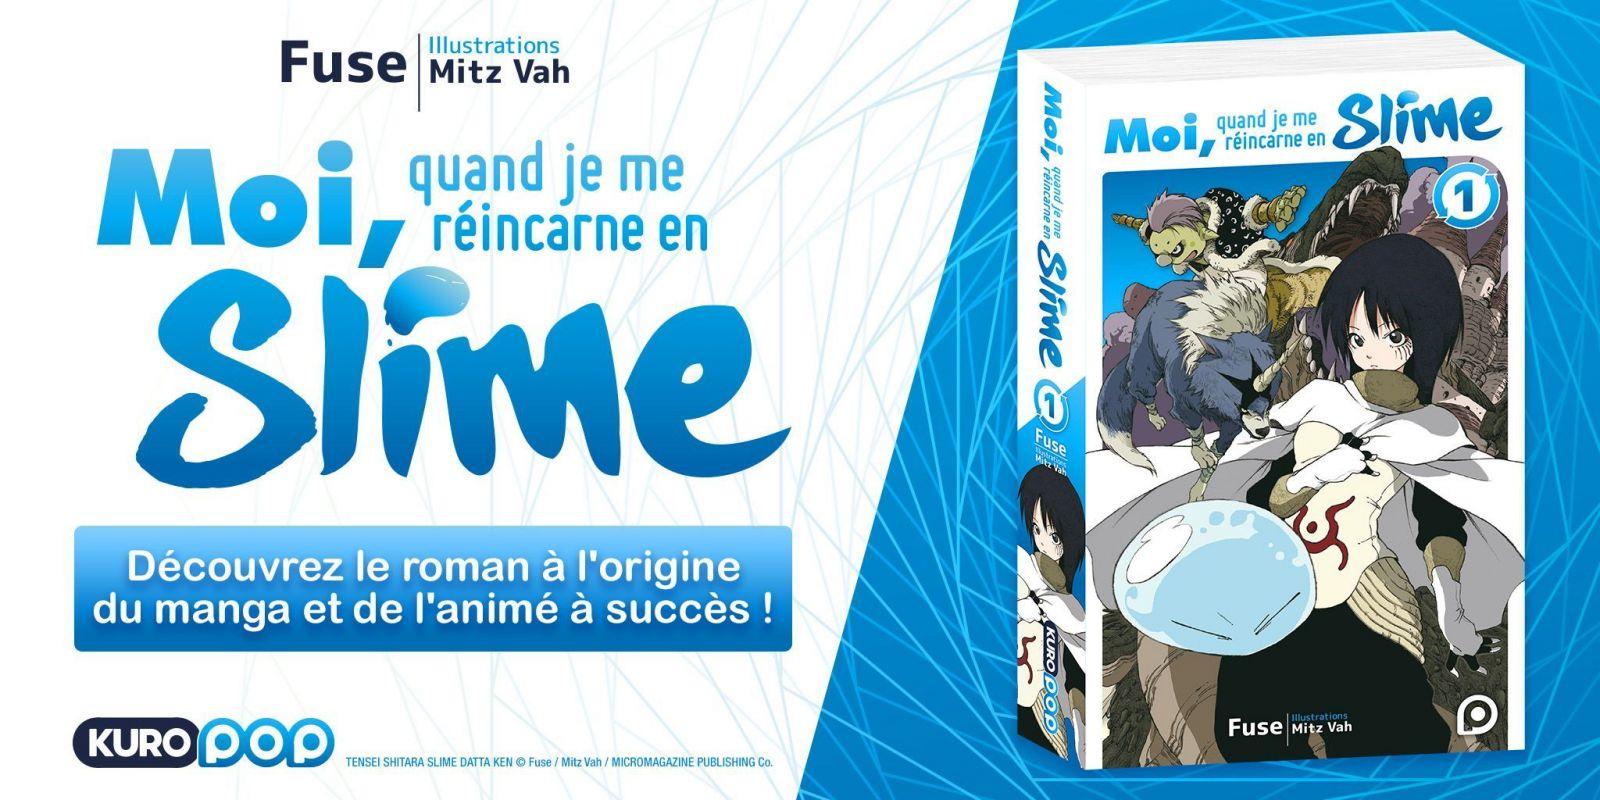 Le roman Moi, quand je me réincarne en Slime chez Kurokawa